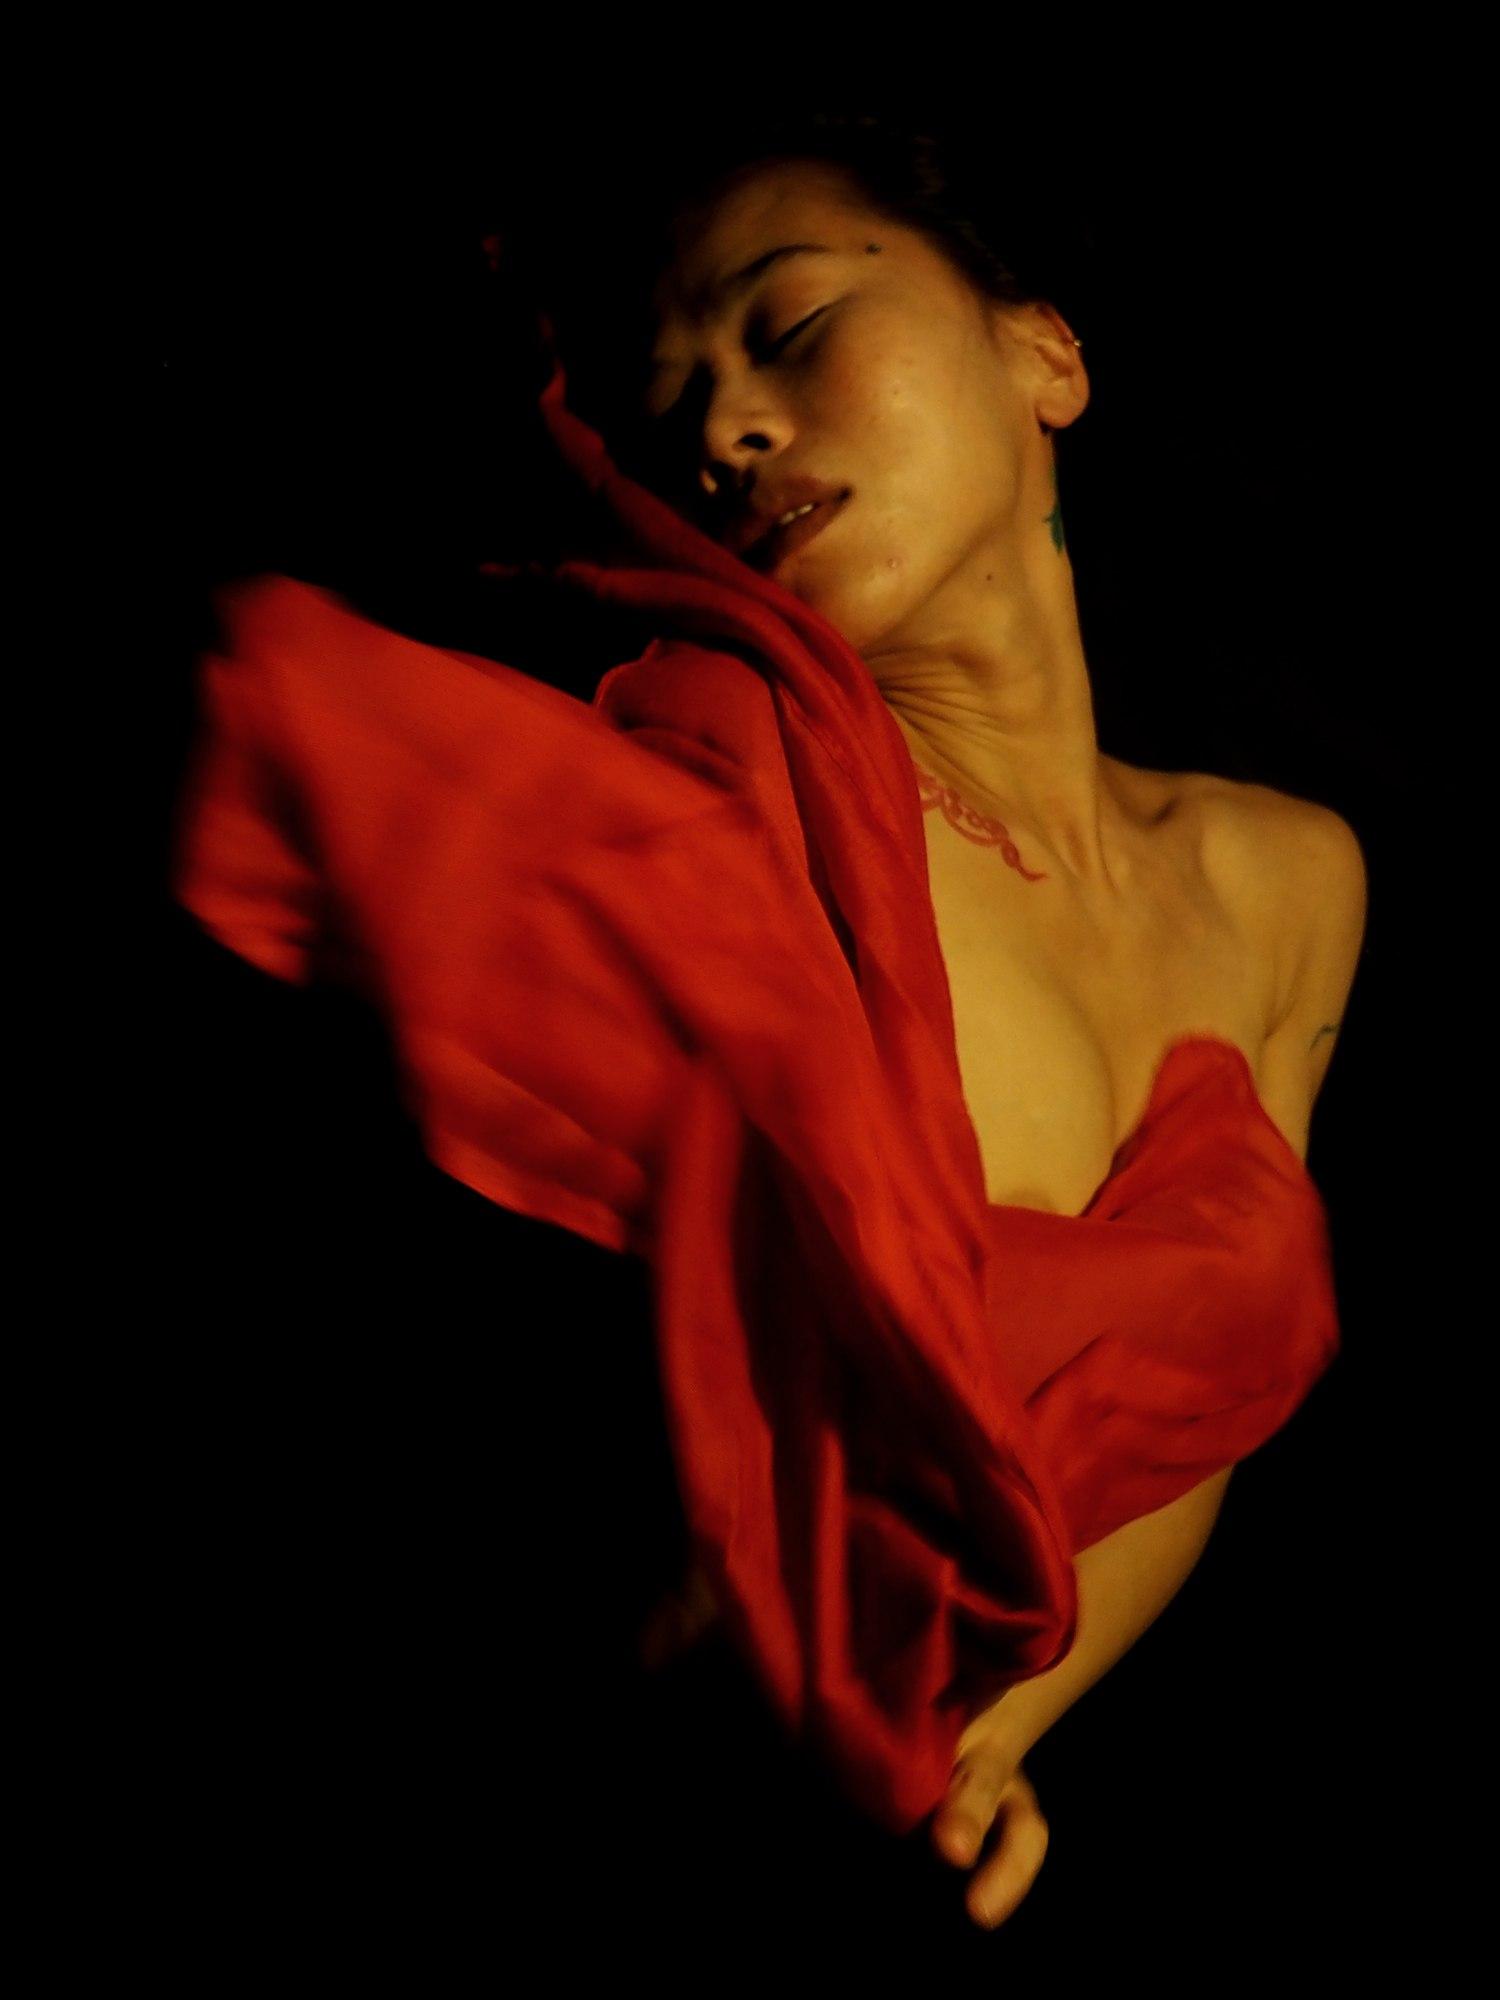 2020 / Red Dream IV / 45x60 cm / Photo by Suelynee 何書伶